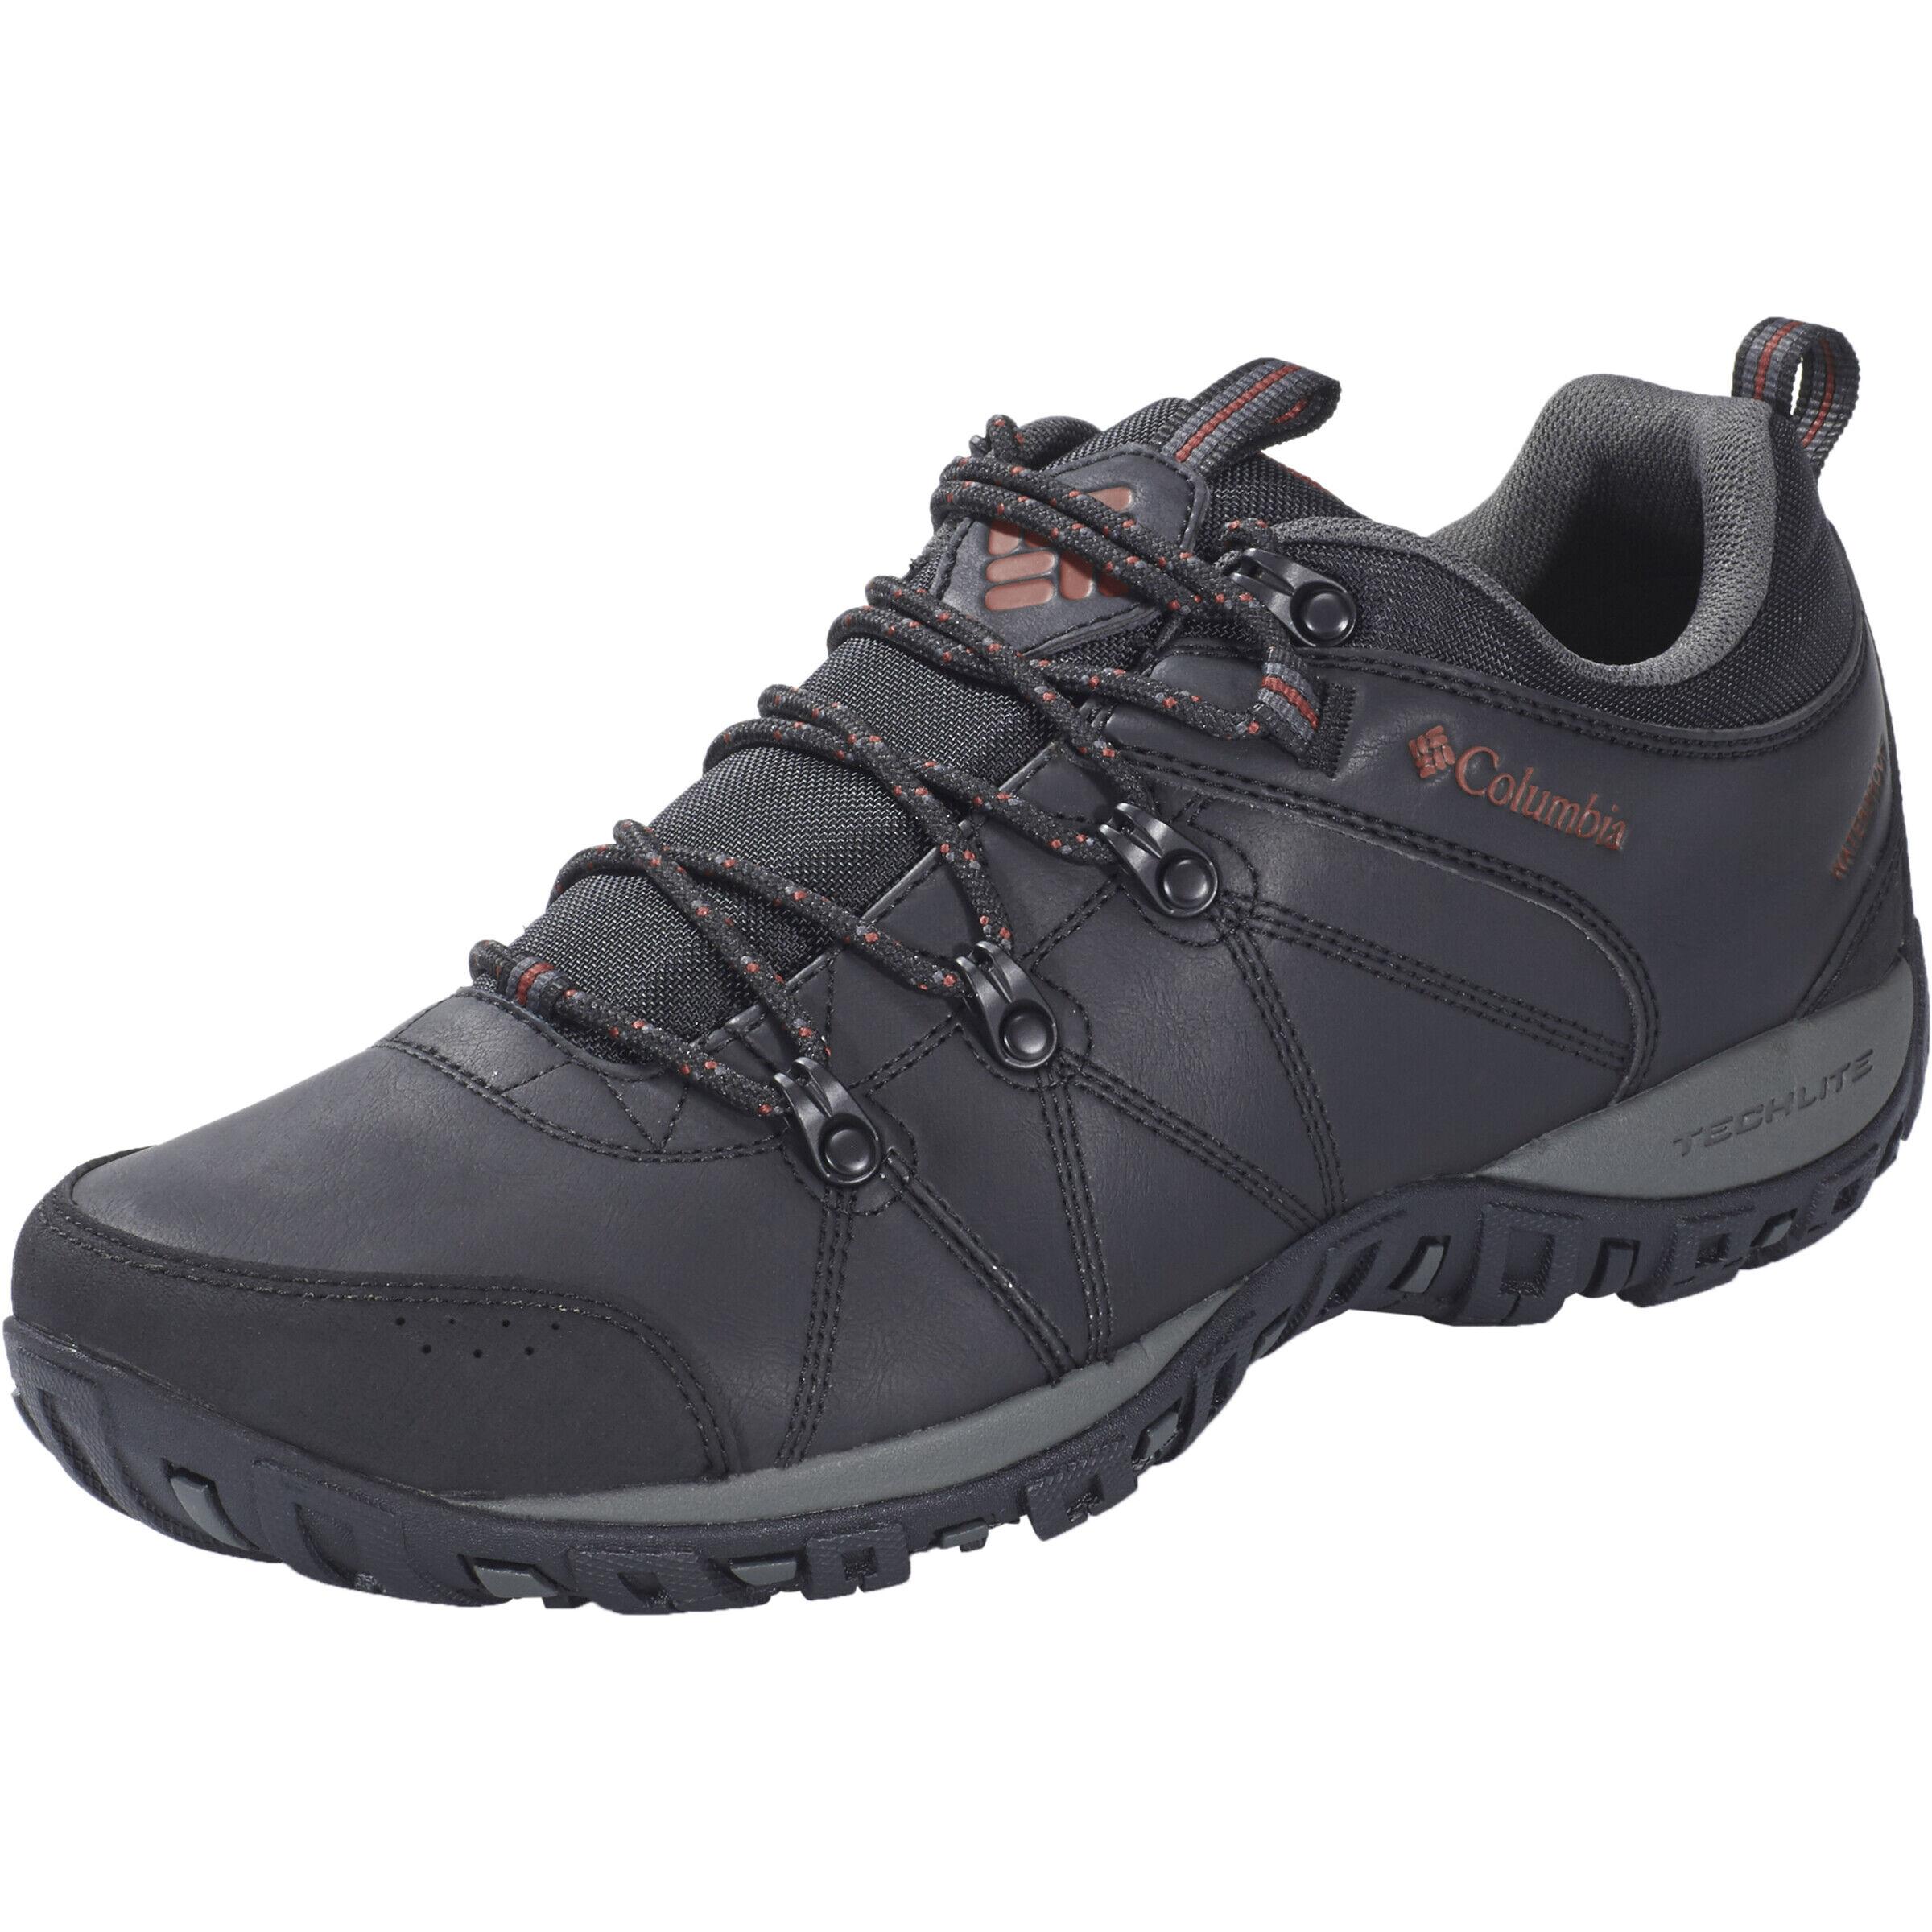 Columbia Peakfreak Venture Shoes Waterproof Herren black gypsy